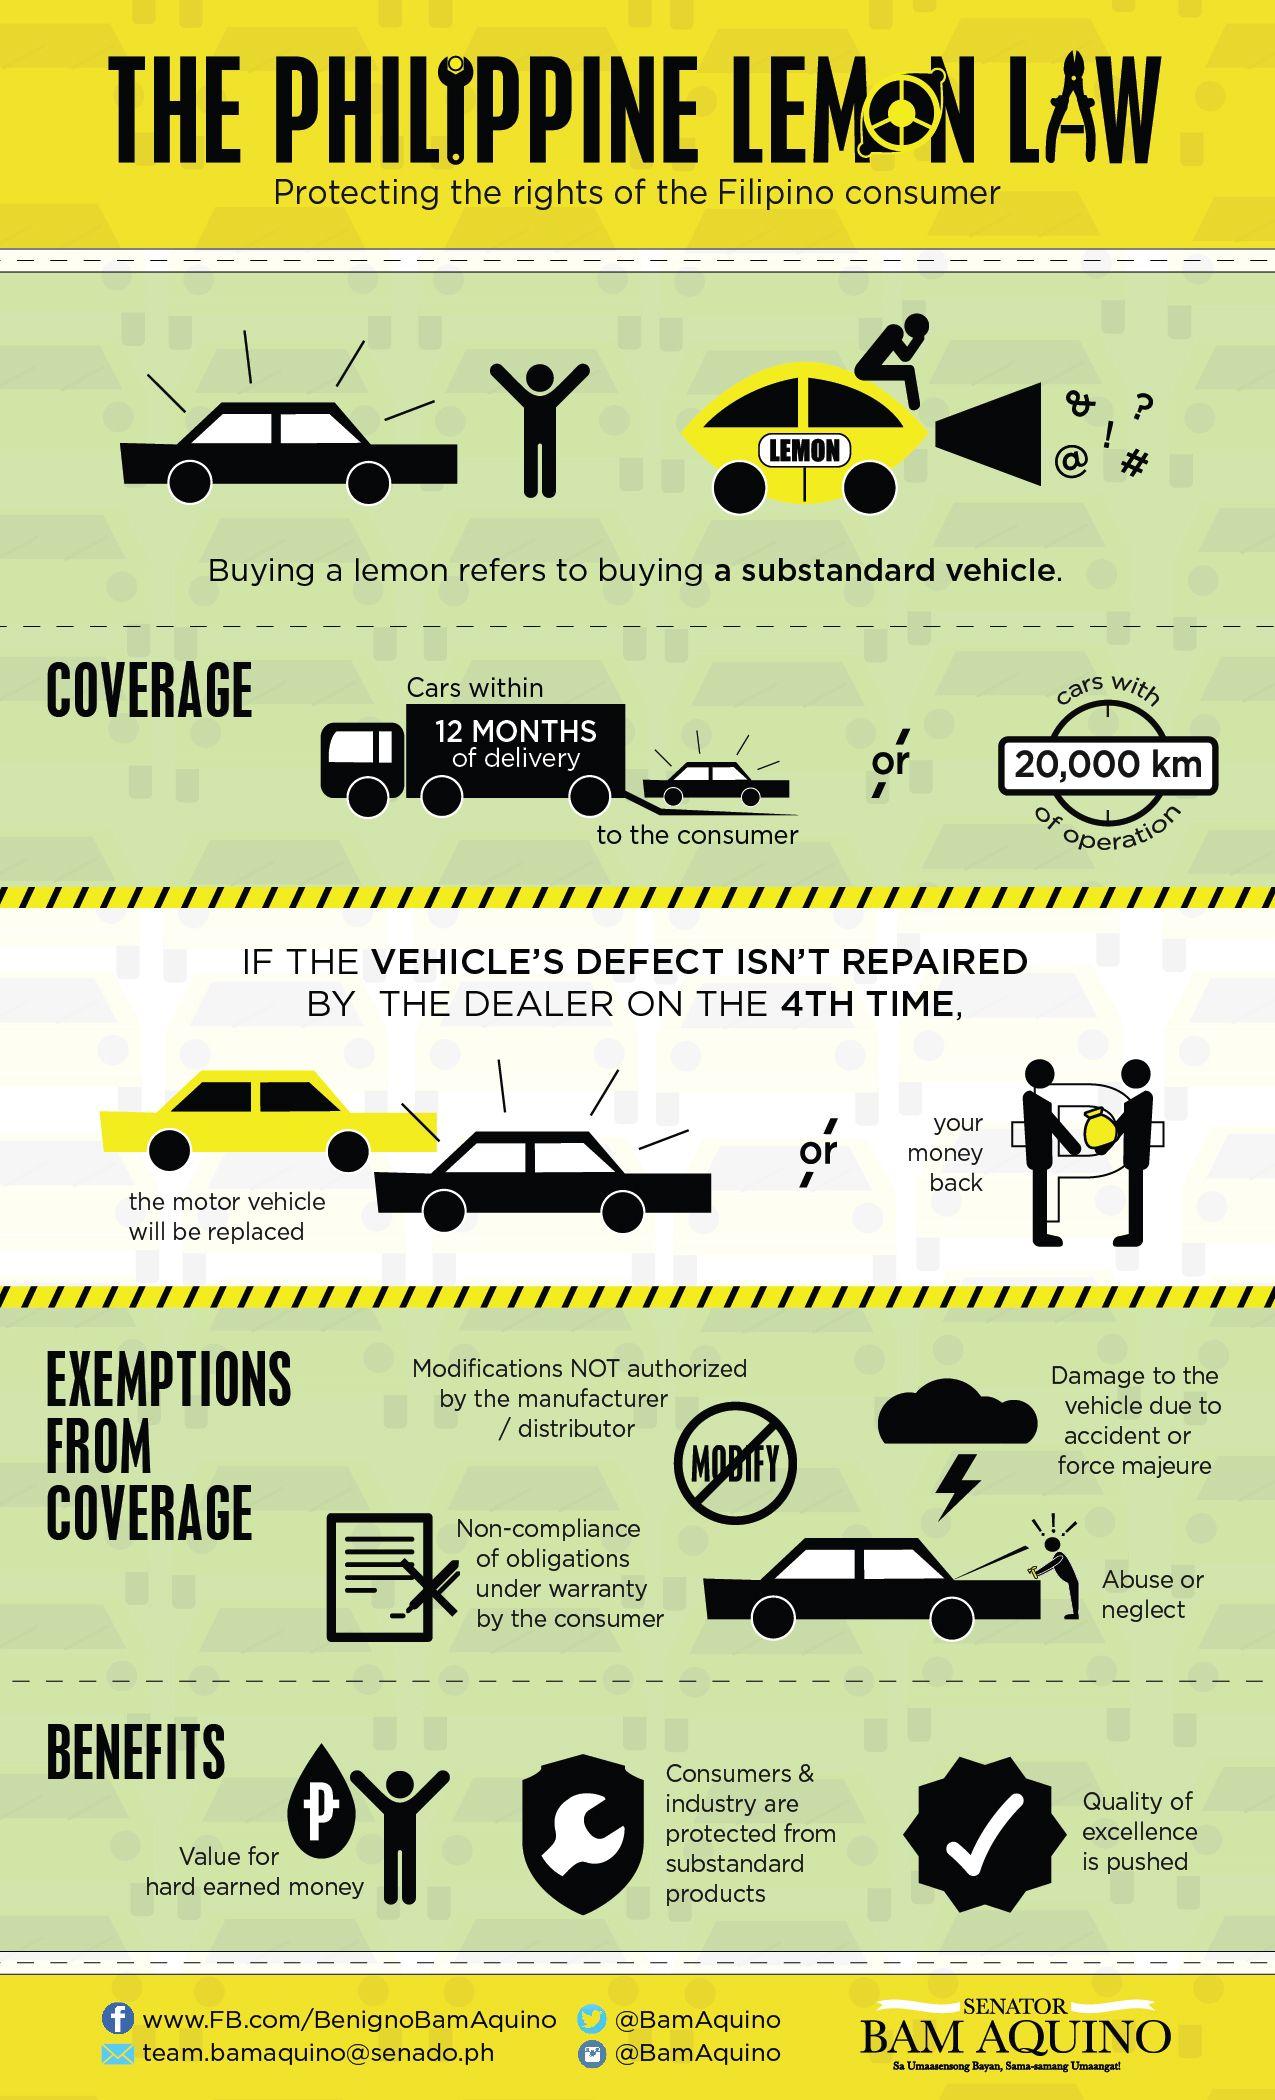 The Philippine Lemon Law. ConsumerRights Lemon law